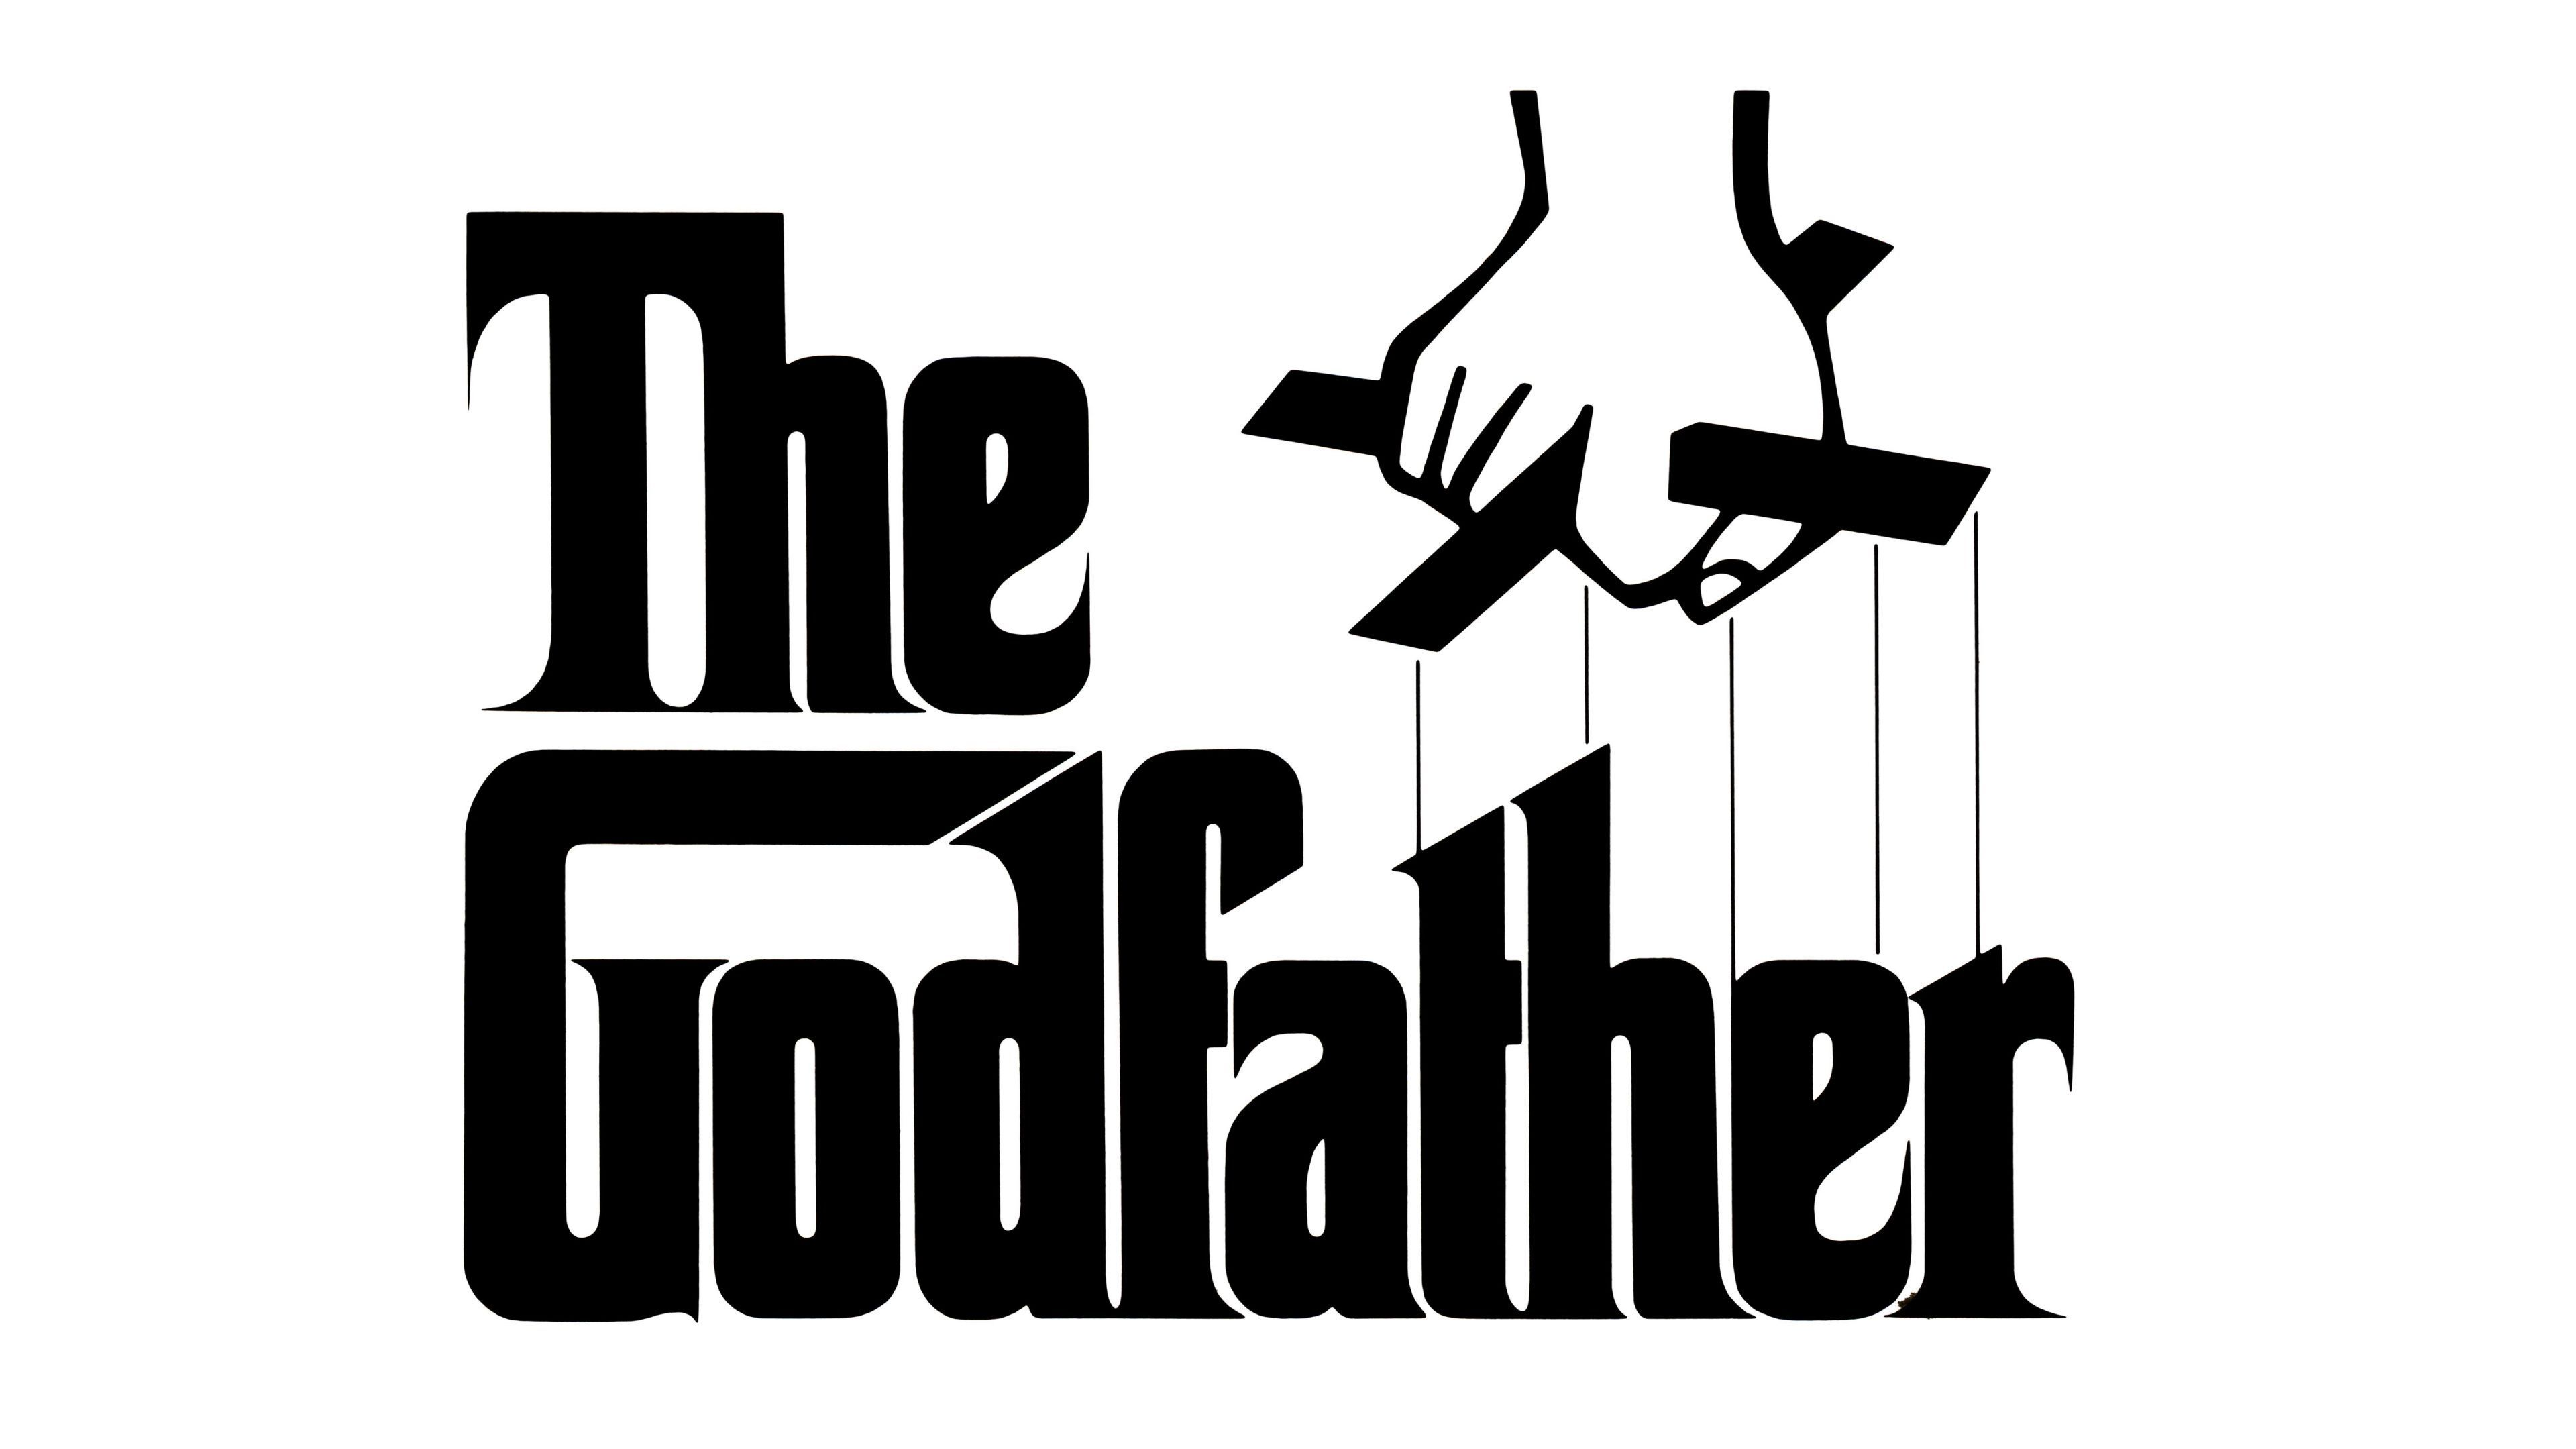 Image Result For Godfather Logo The Godfather Wallpaper The Godfather The Godfather Poster